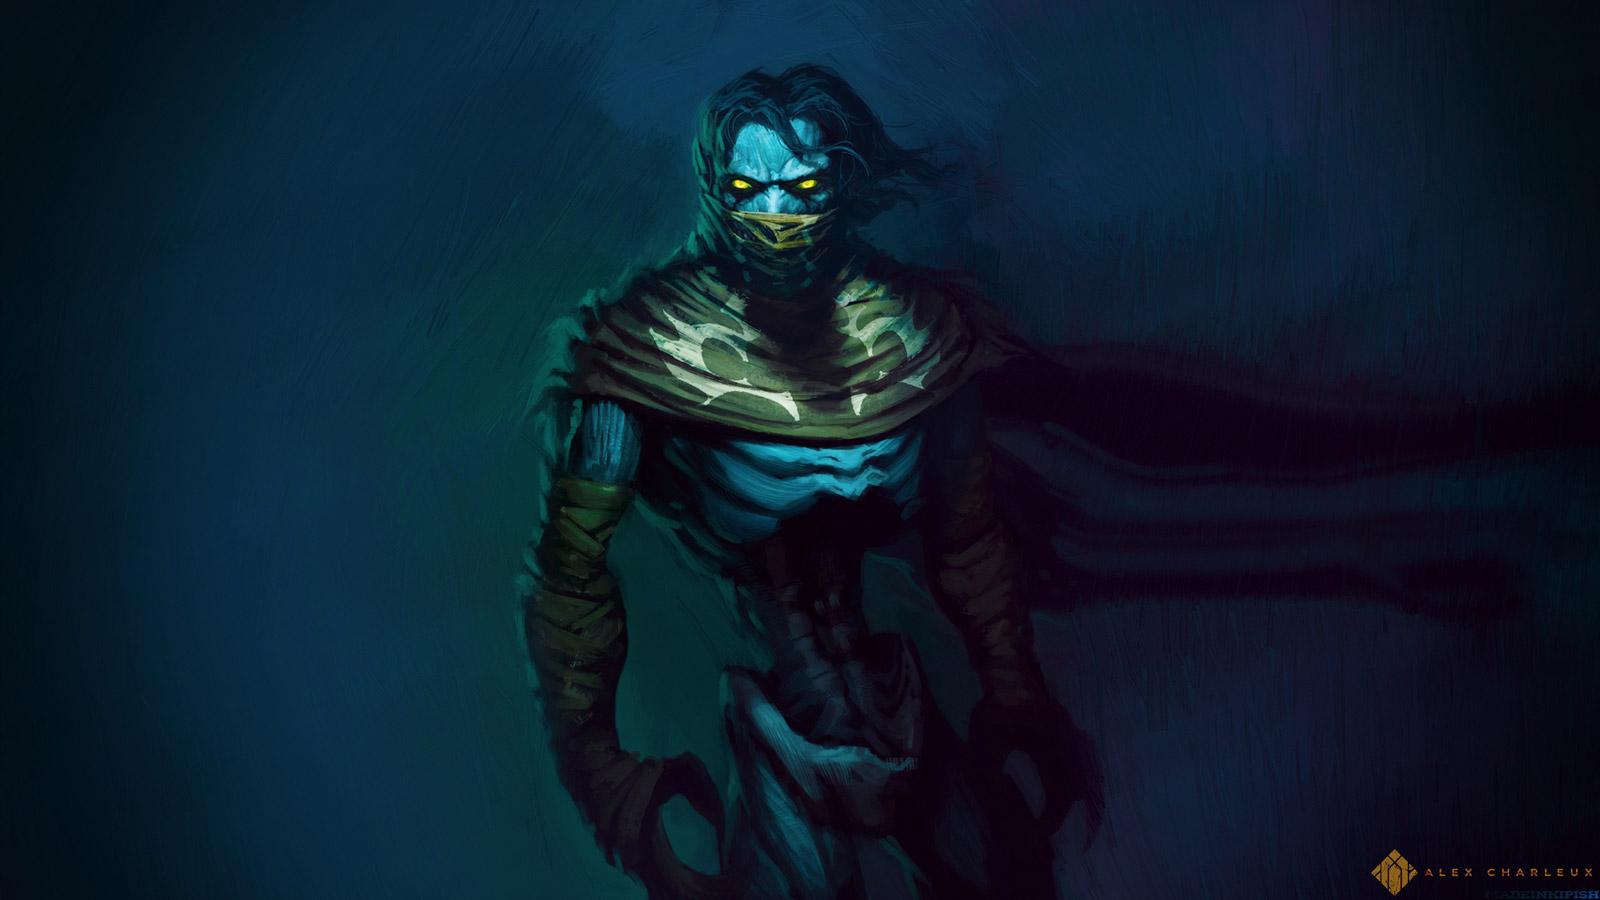 Free Legacy of Kain: Soul Reaver Wallpaper in 1600x900